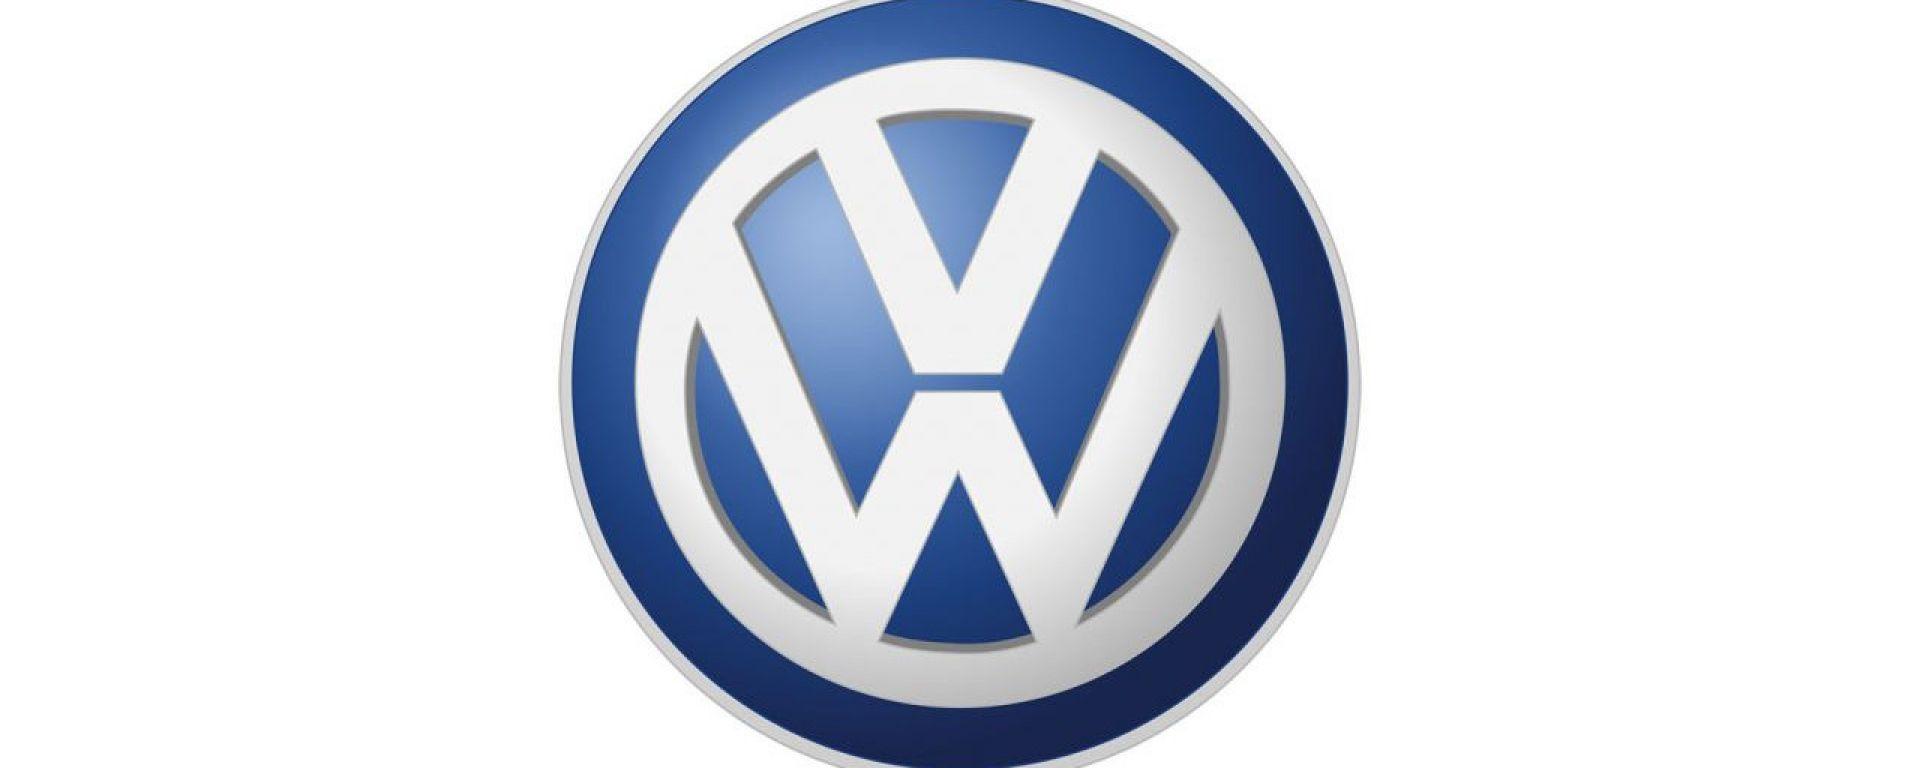 Volkswagen, in arrivo un nuovo logo